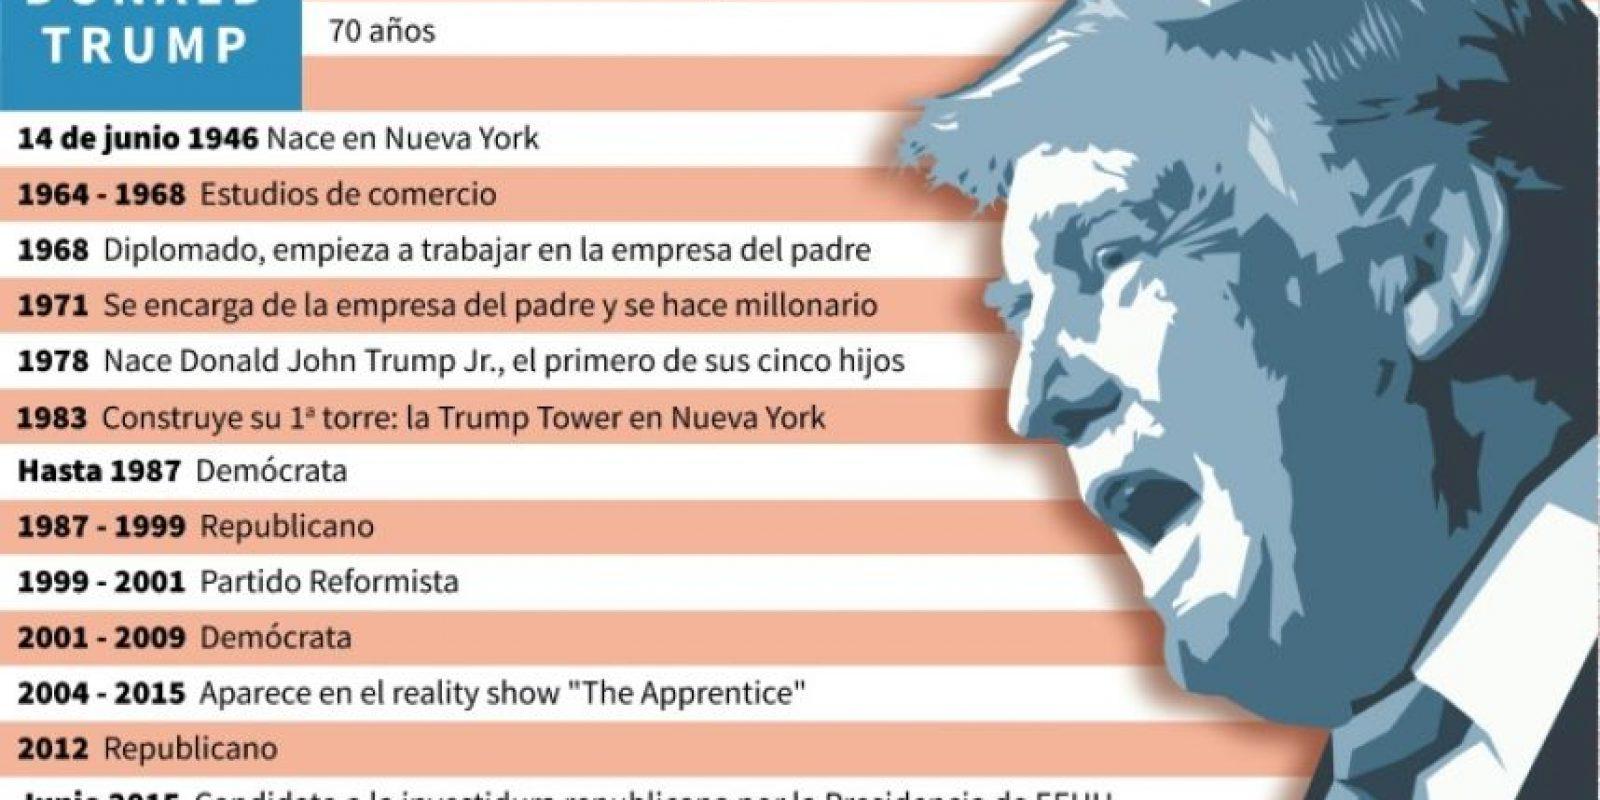 Donald Trump Foto:Philippe MOUCHE/afp.com